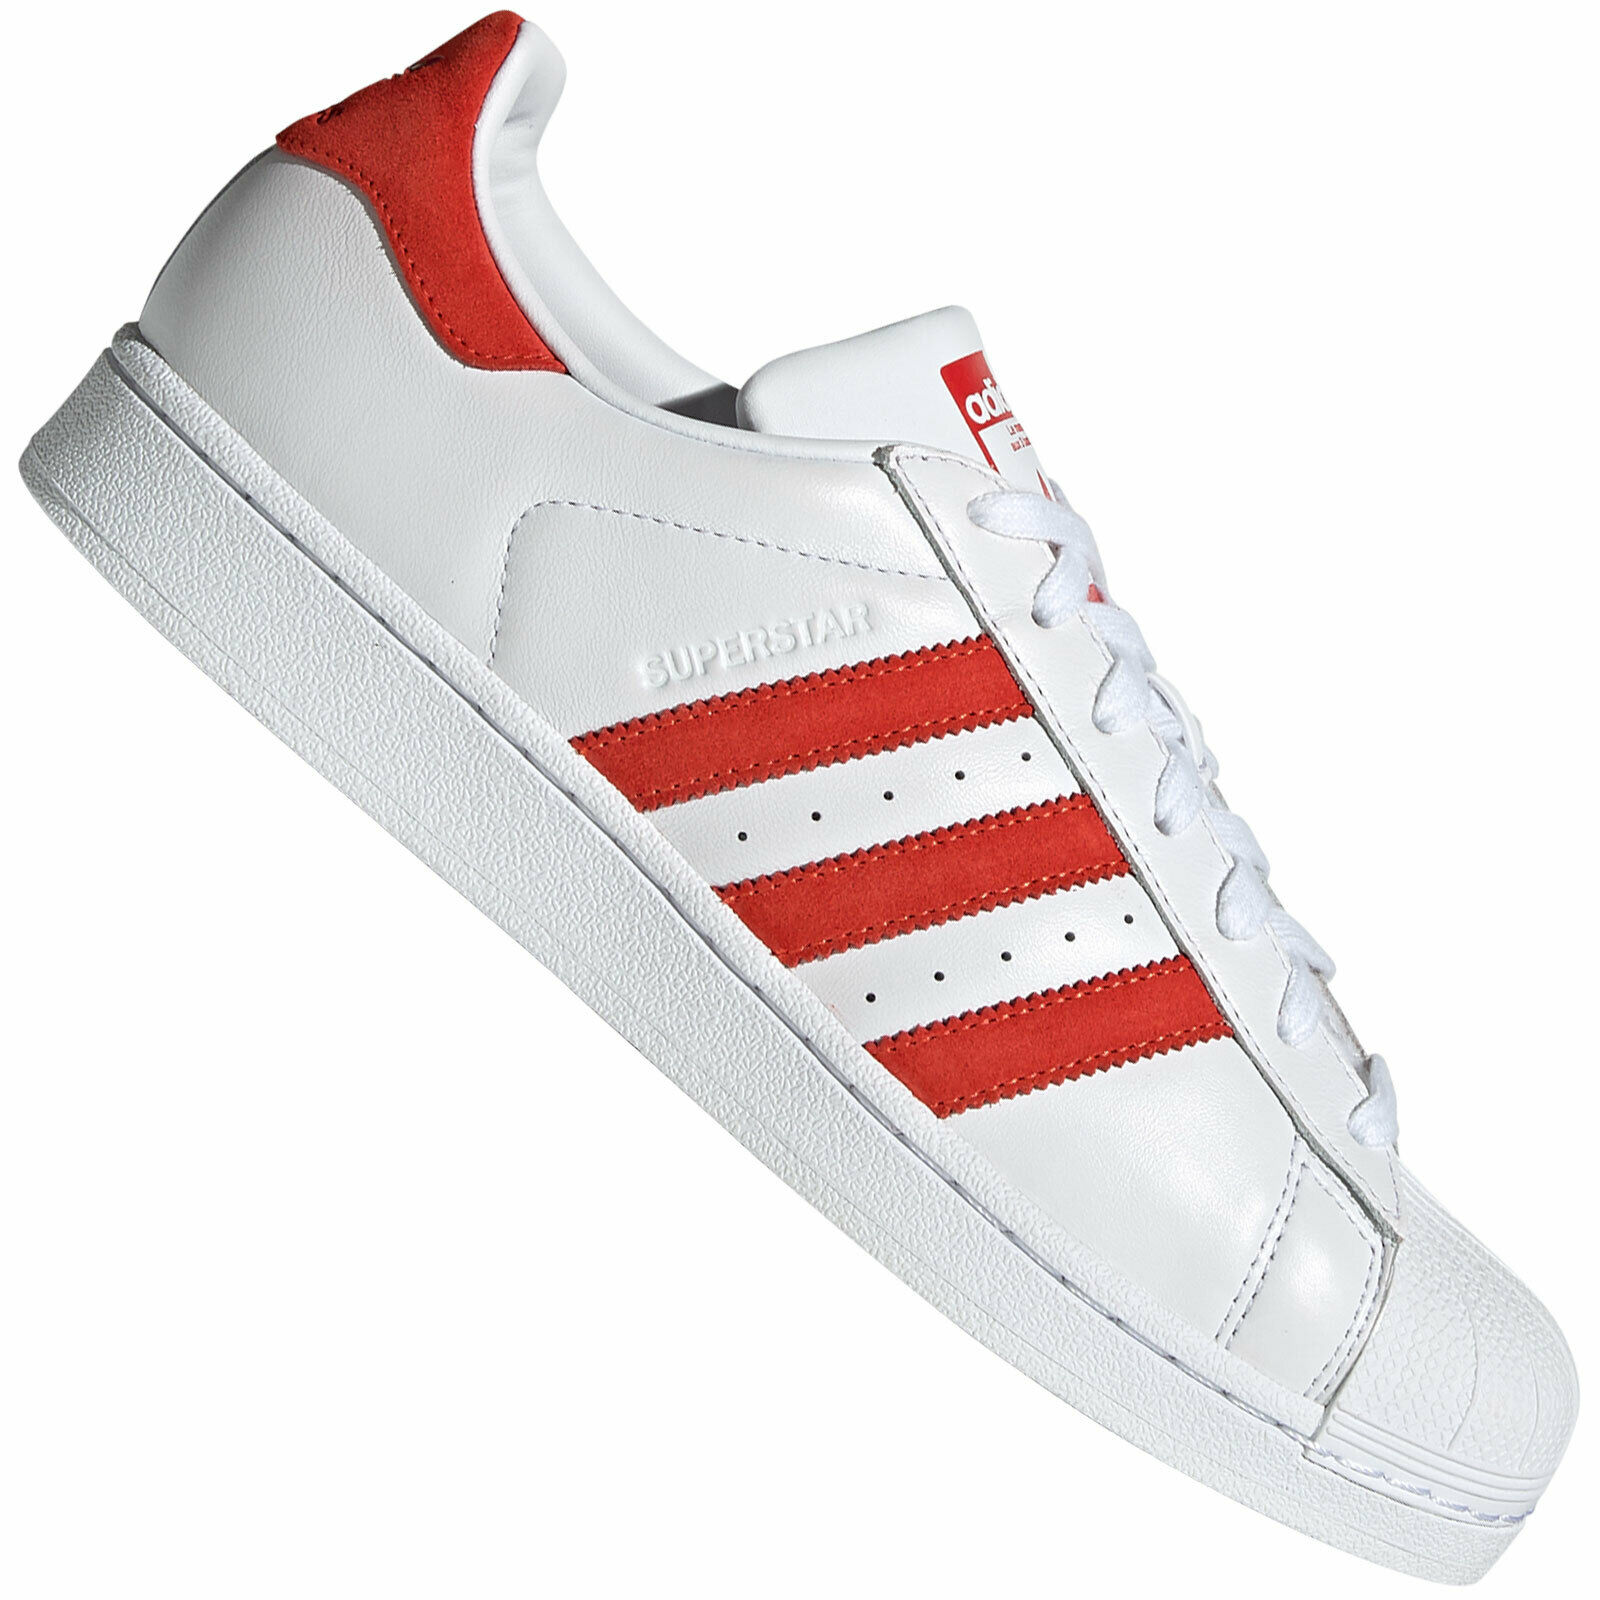 Adidas Originals Superstar scarpe da ginnastica scarpe Lace up  EF9237 Suede rosso  punti vendita